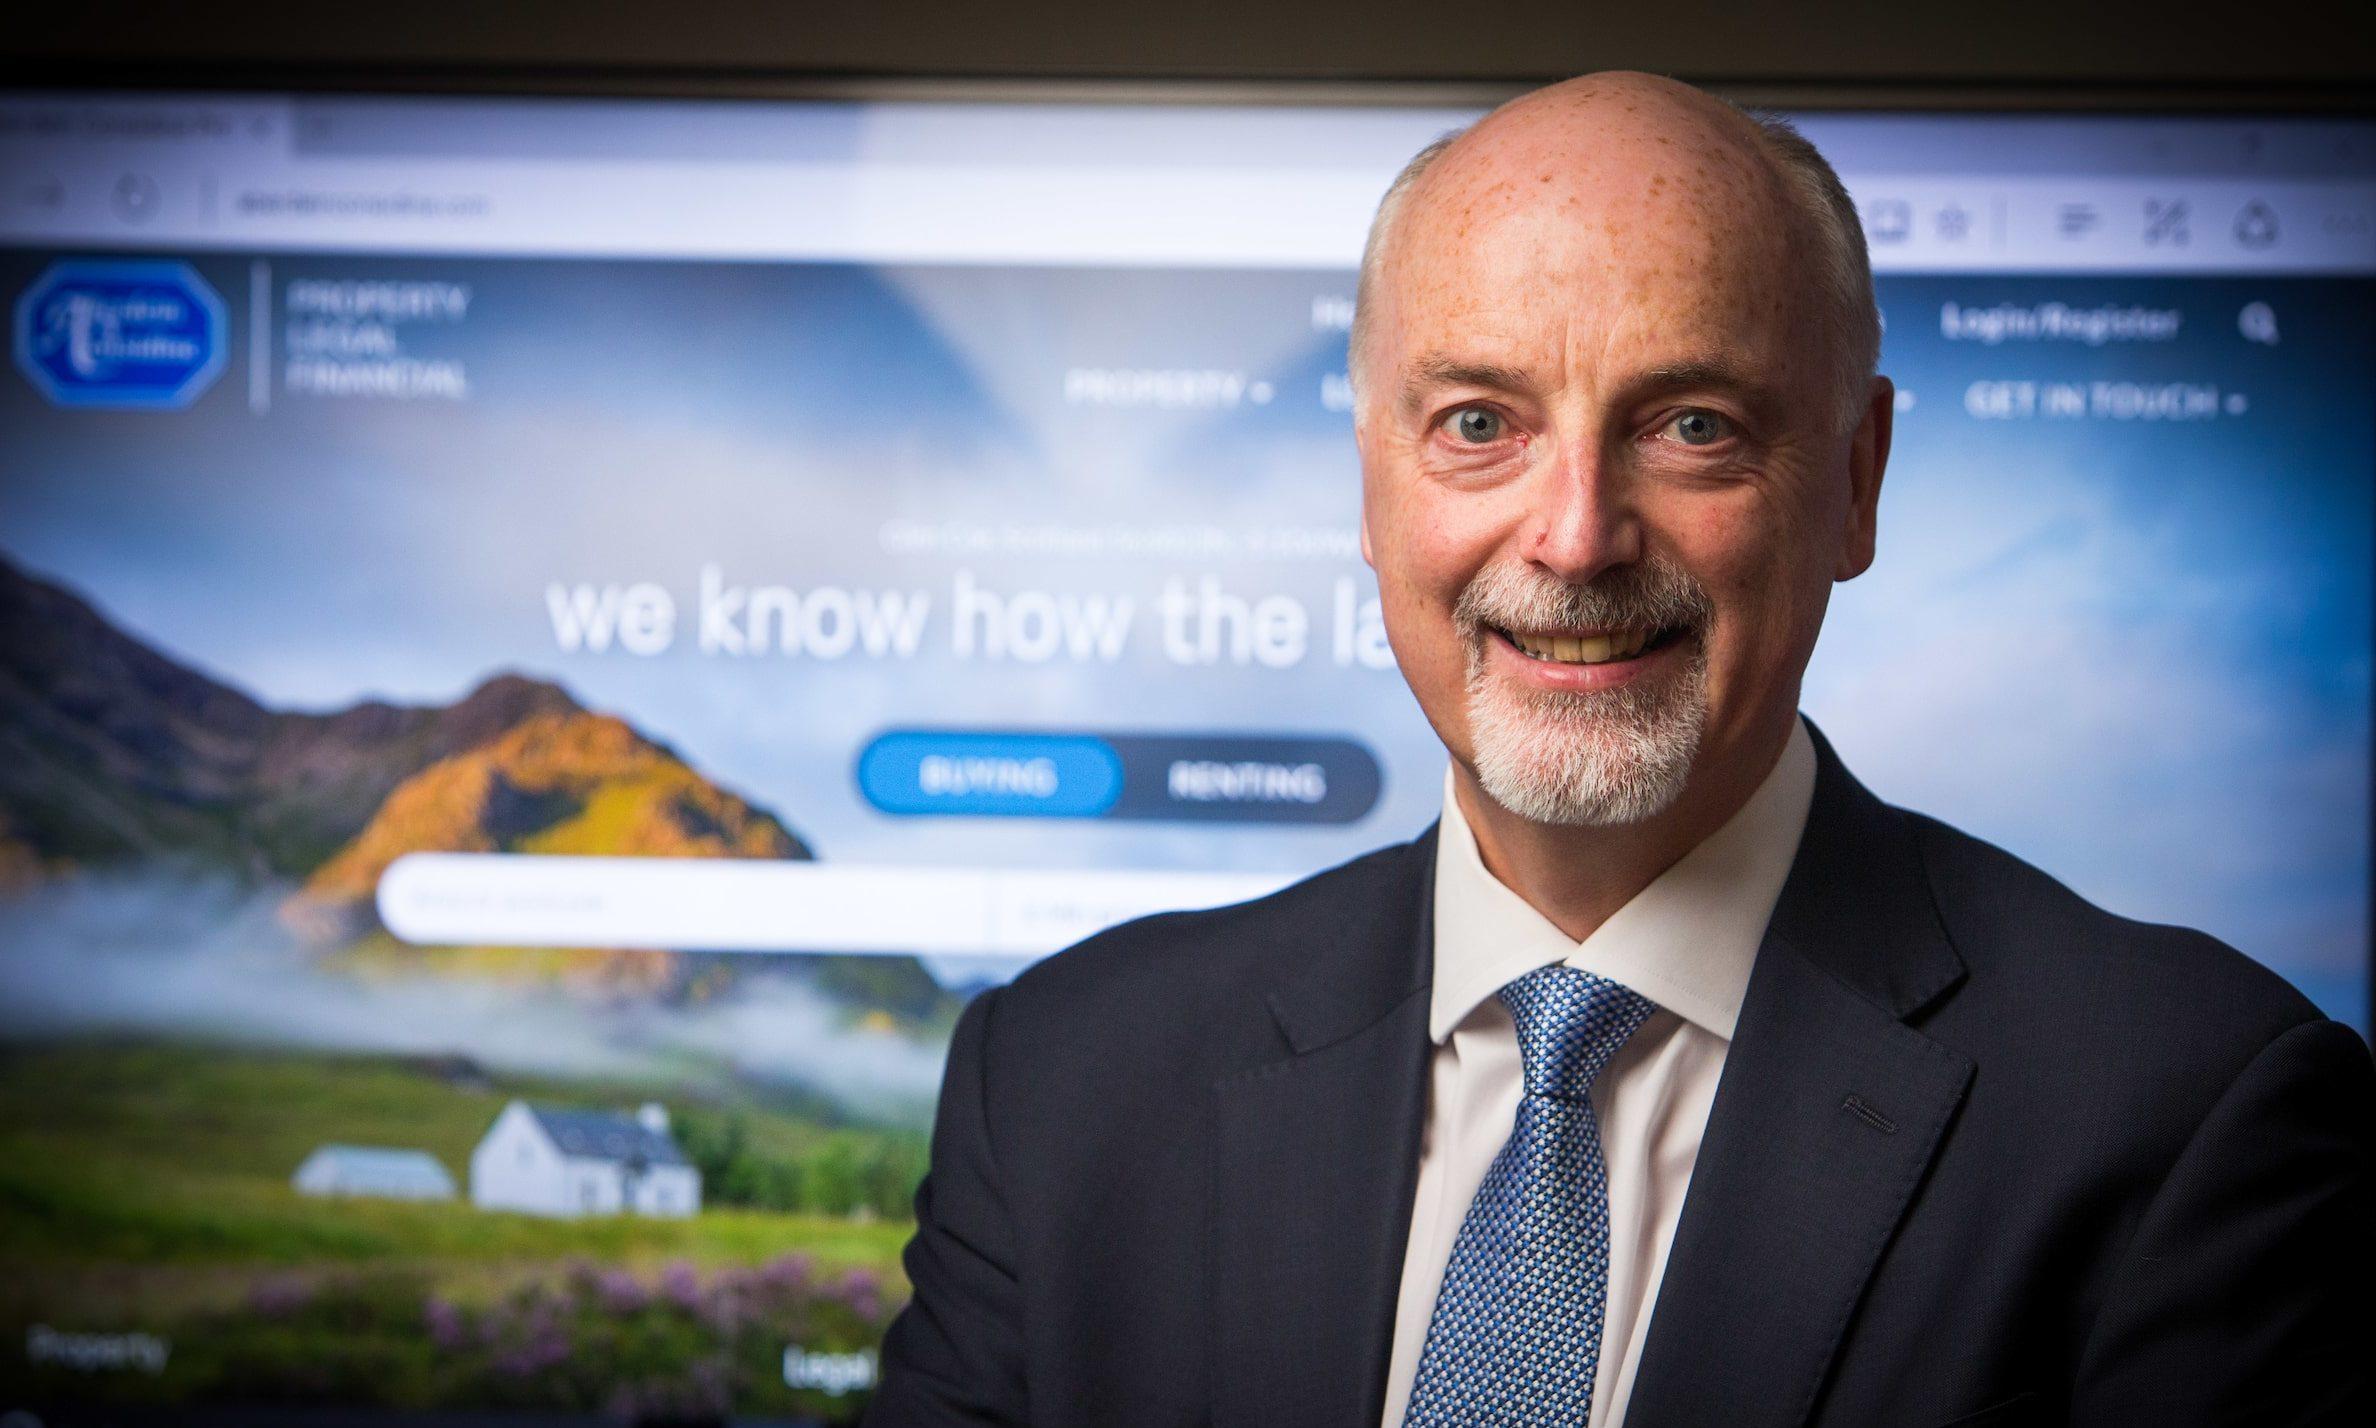 Bob Fraser, senior property partner at Aberdein Considine.